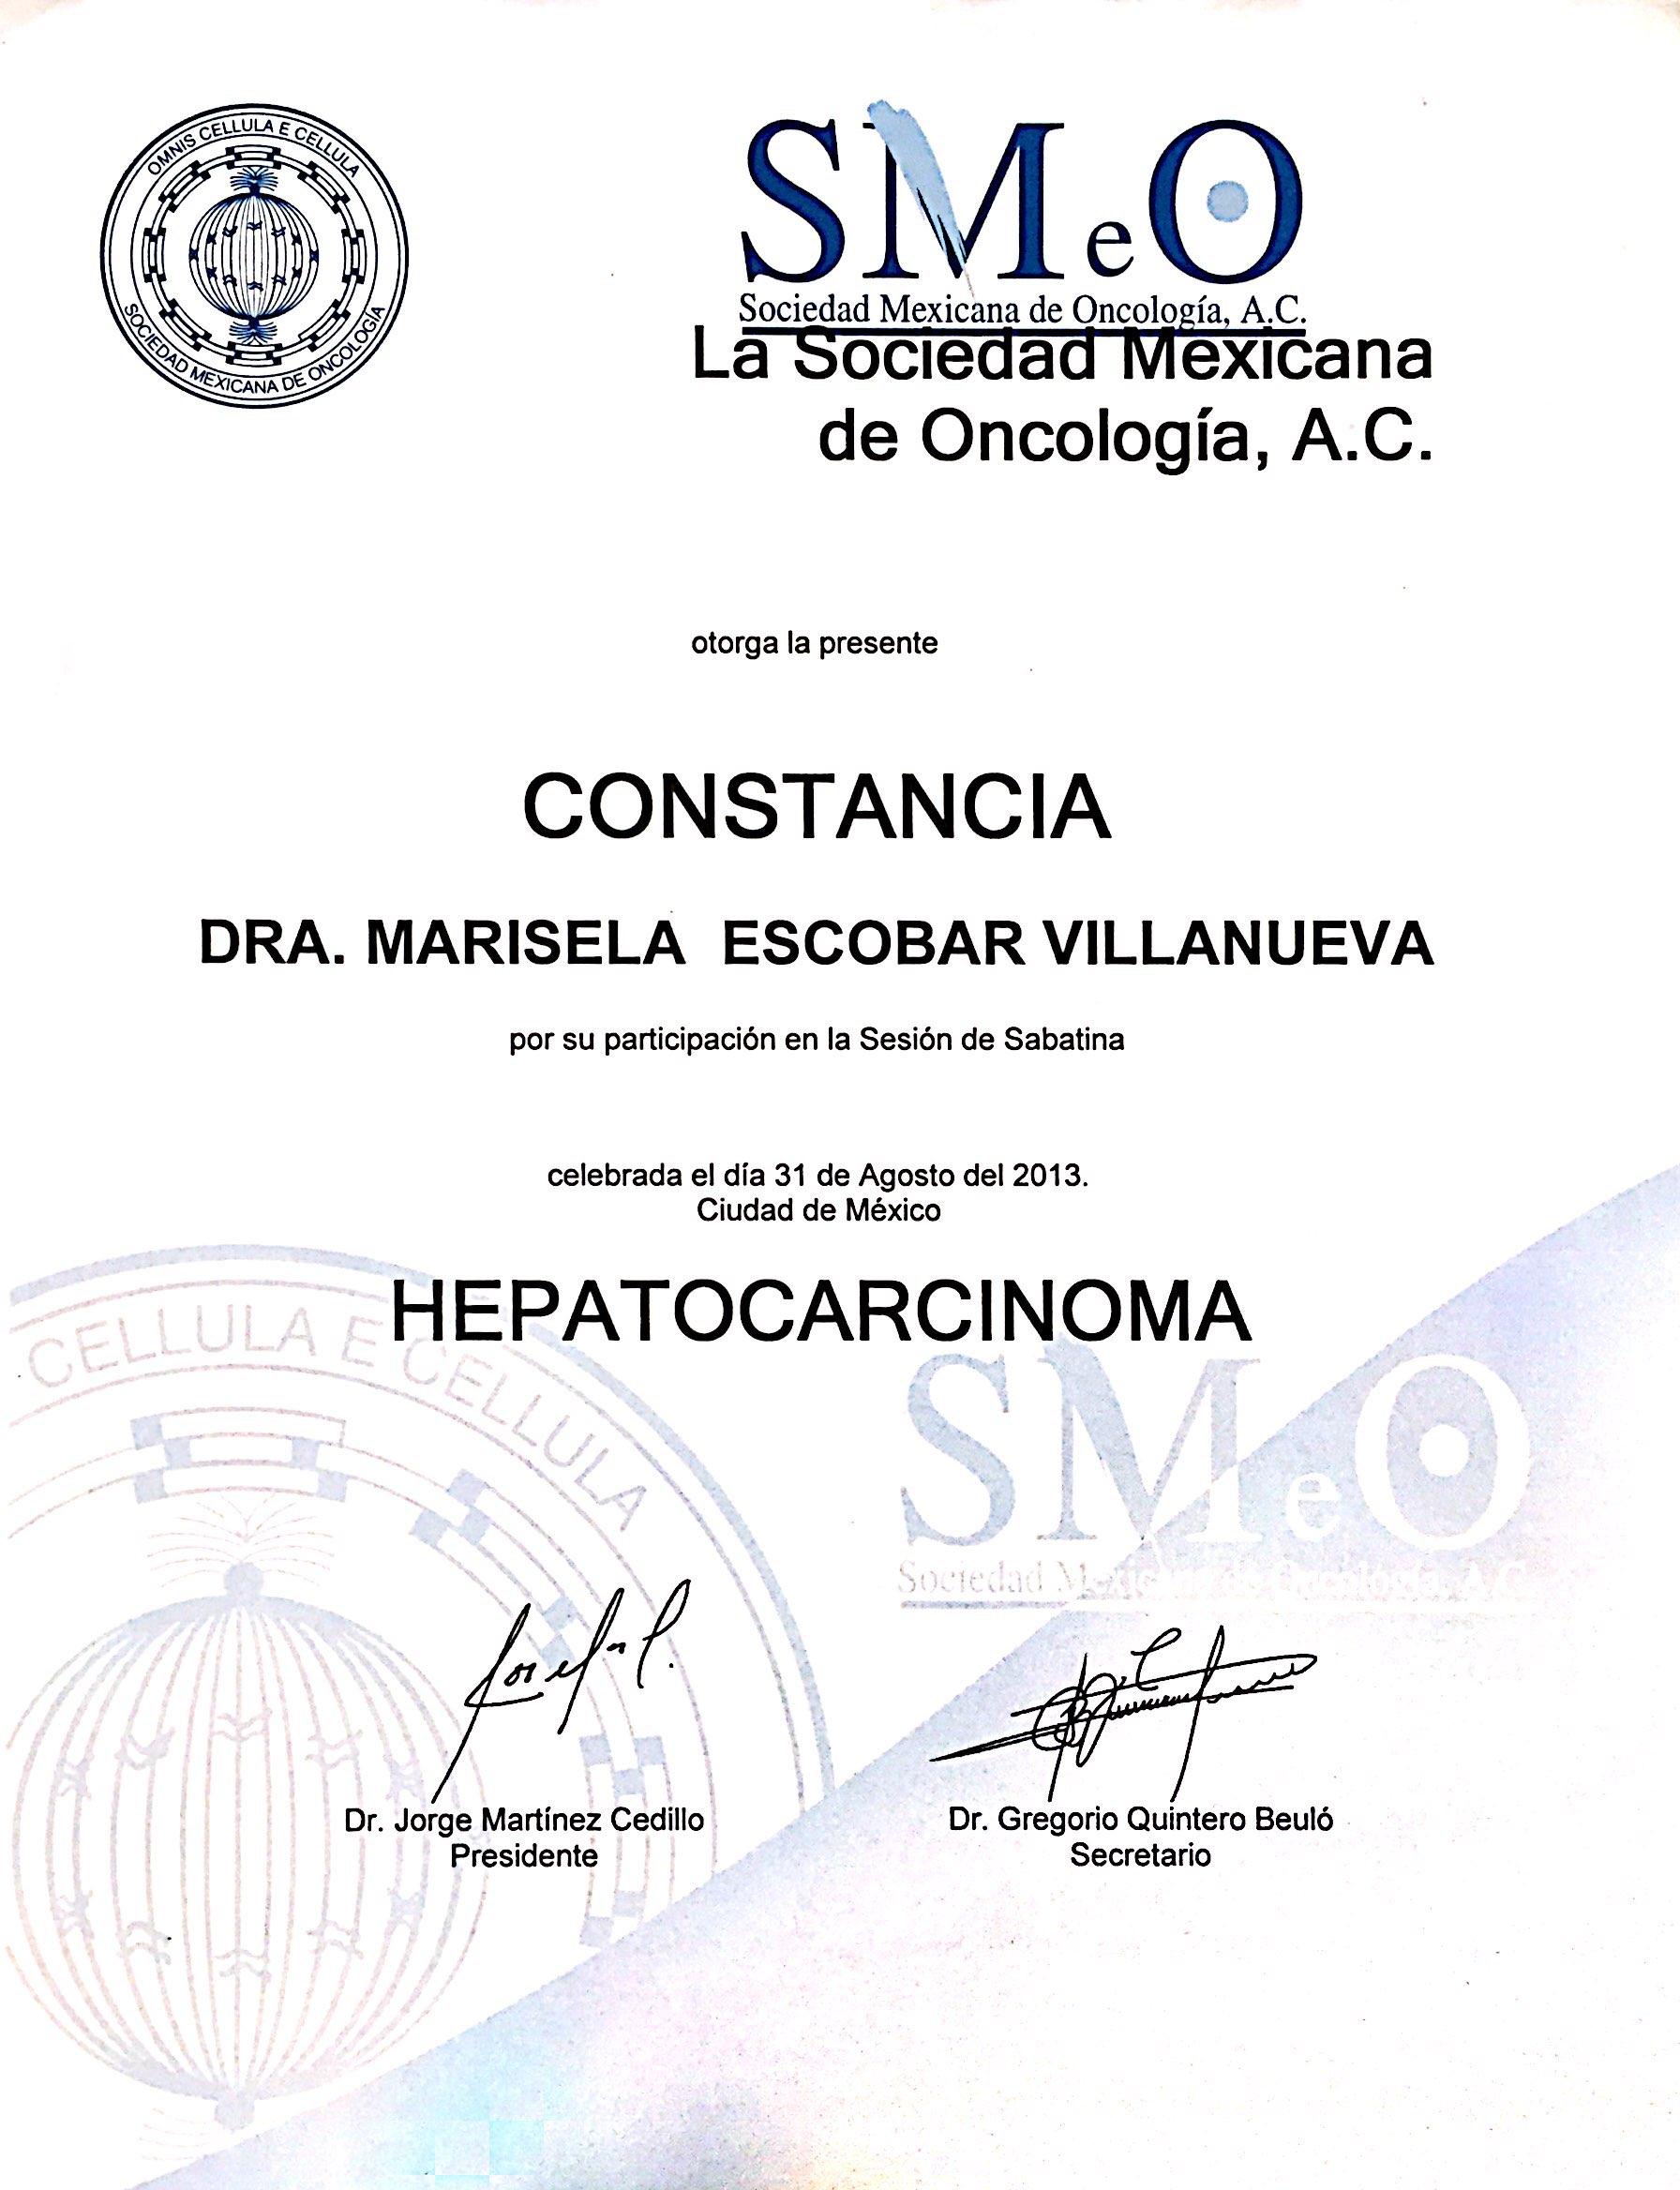 Nuevo doc 2018-02-20 11.21.39_15